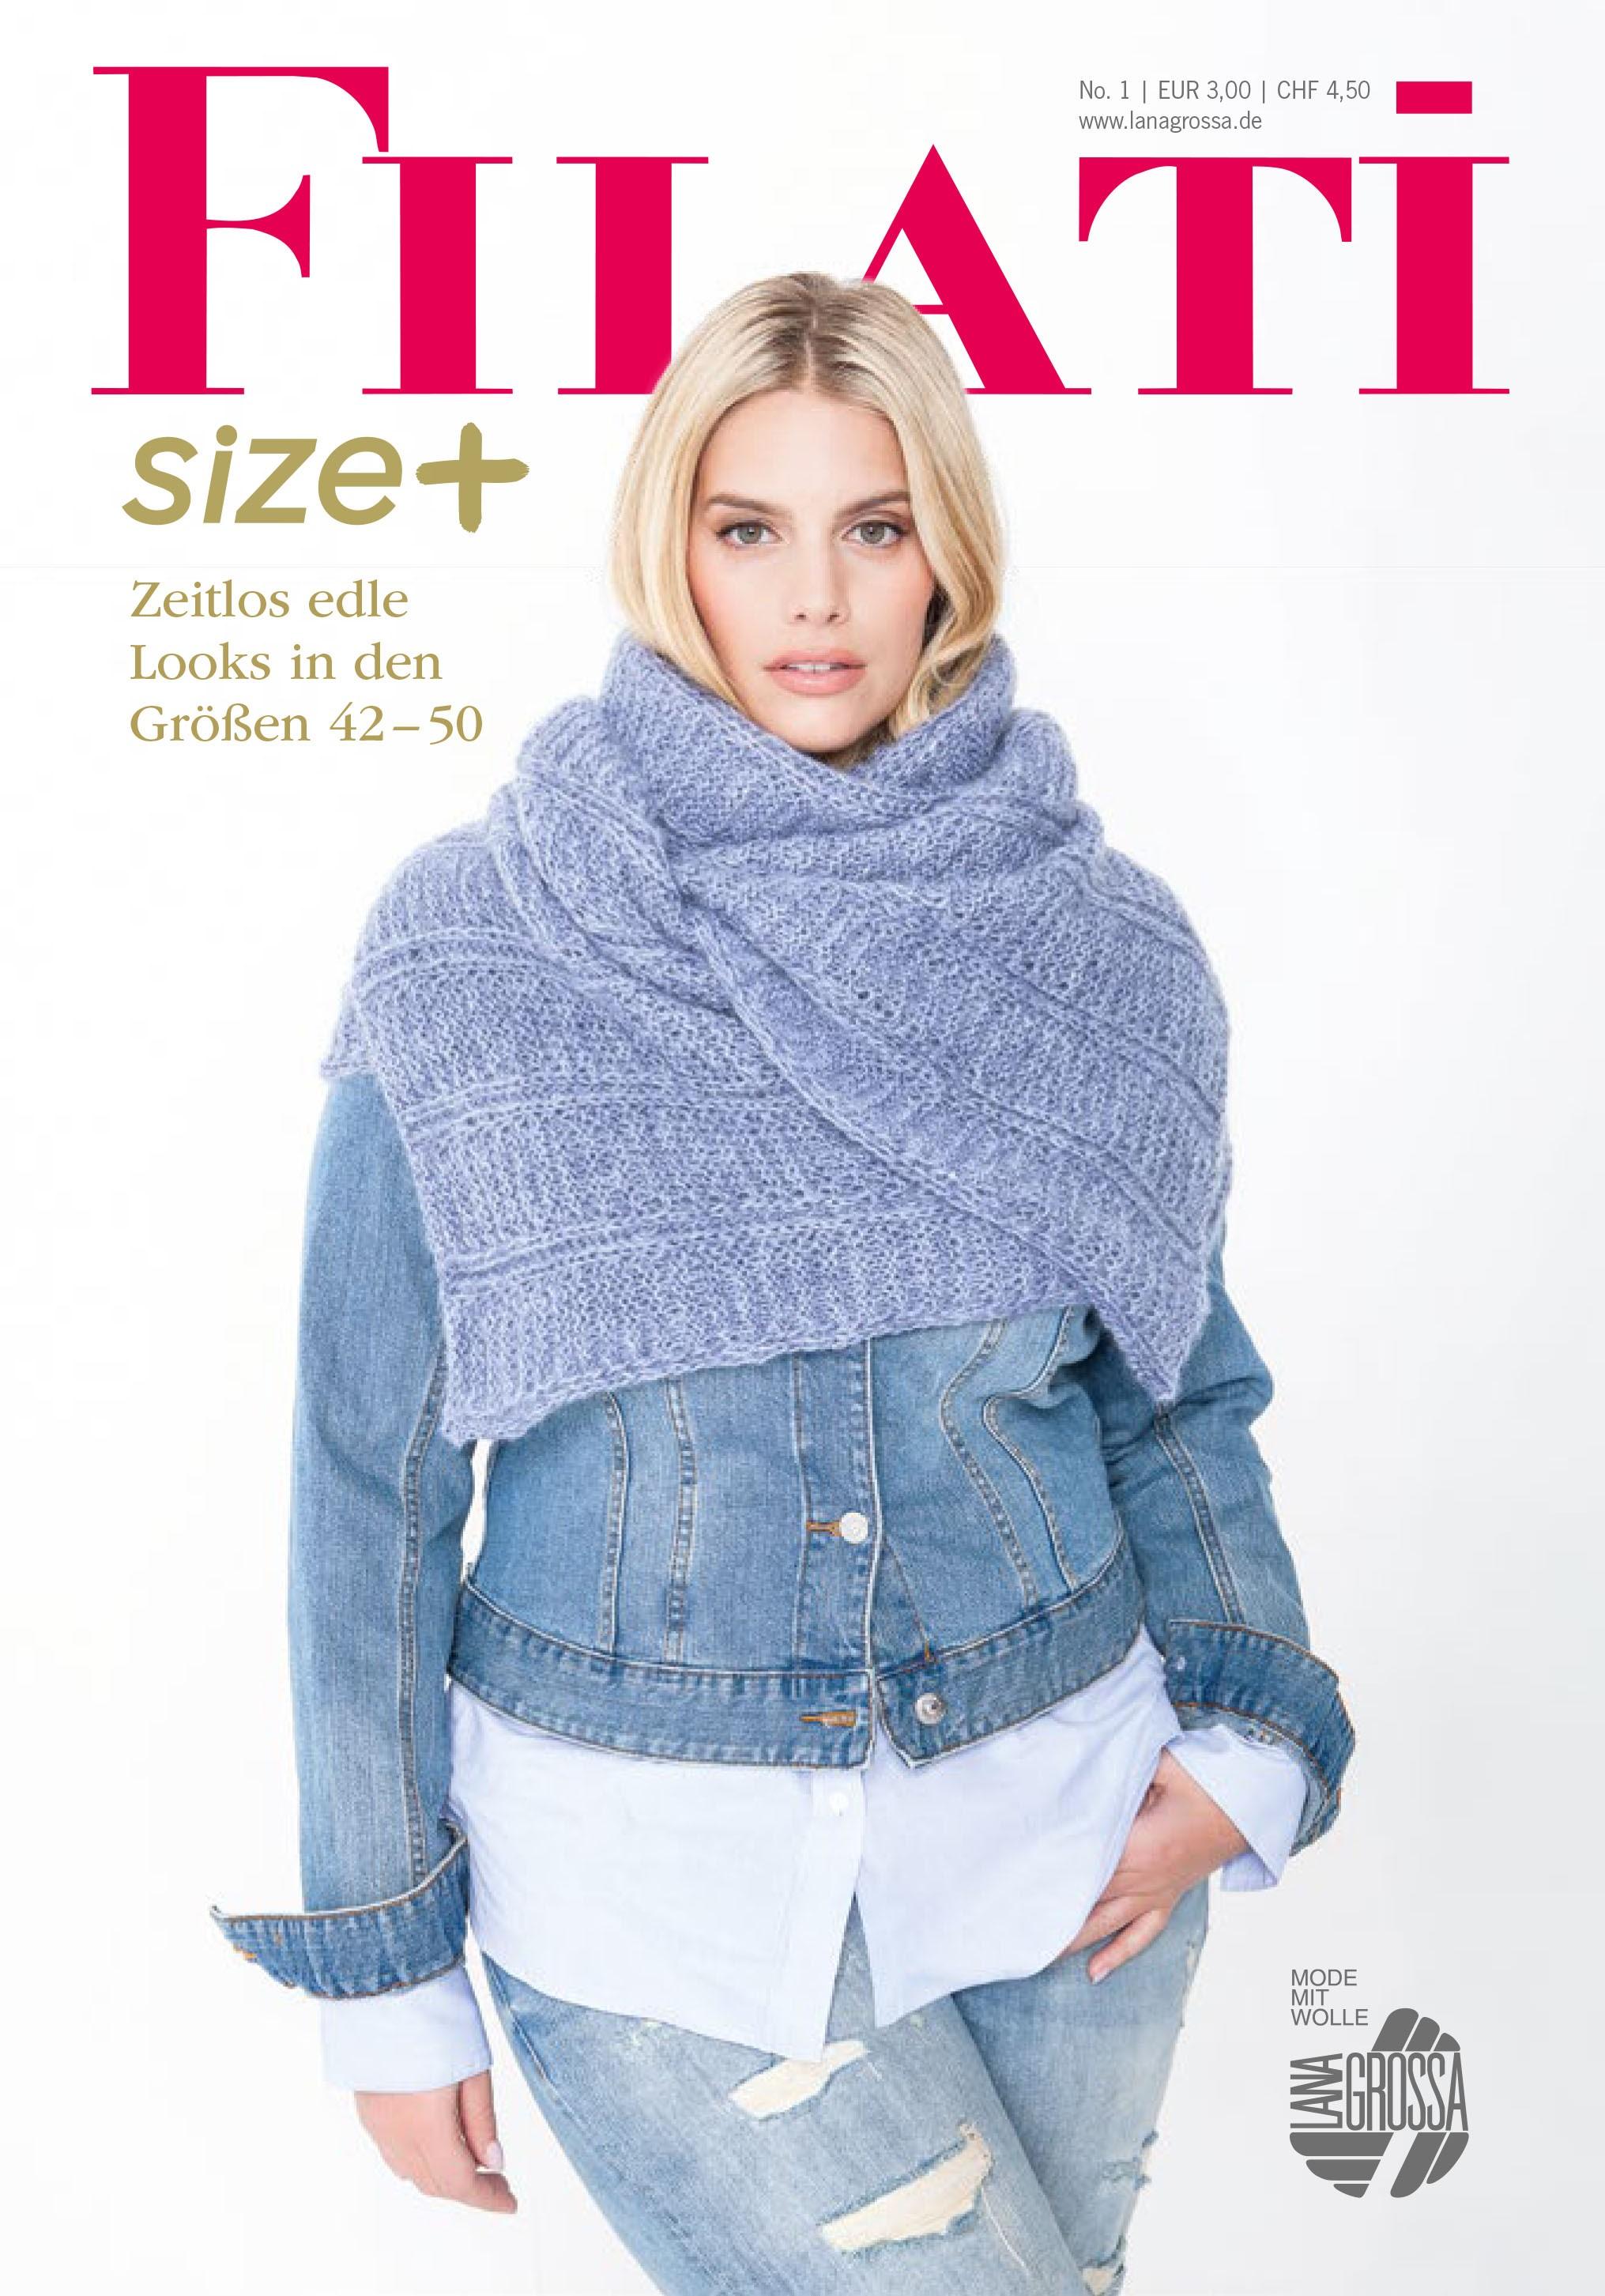 Lana Grossa FILATI Size Plus